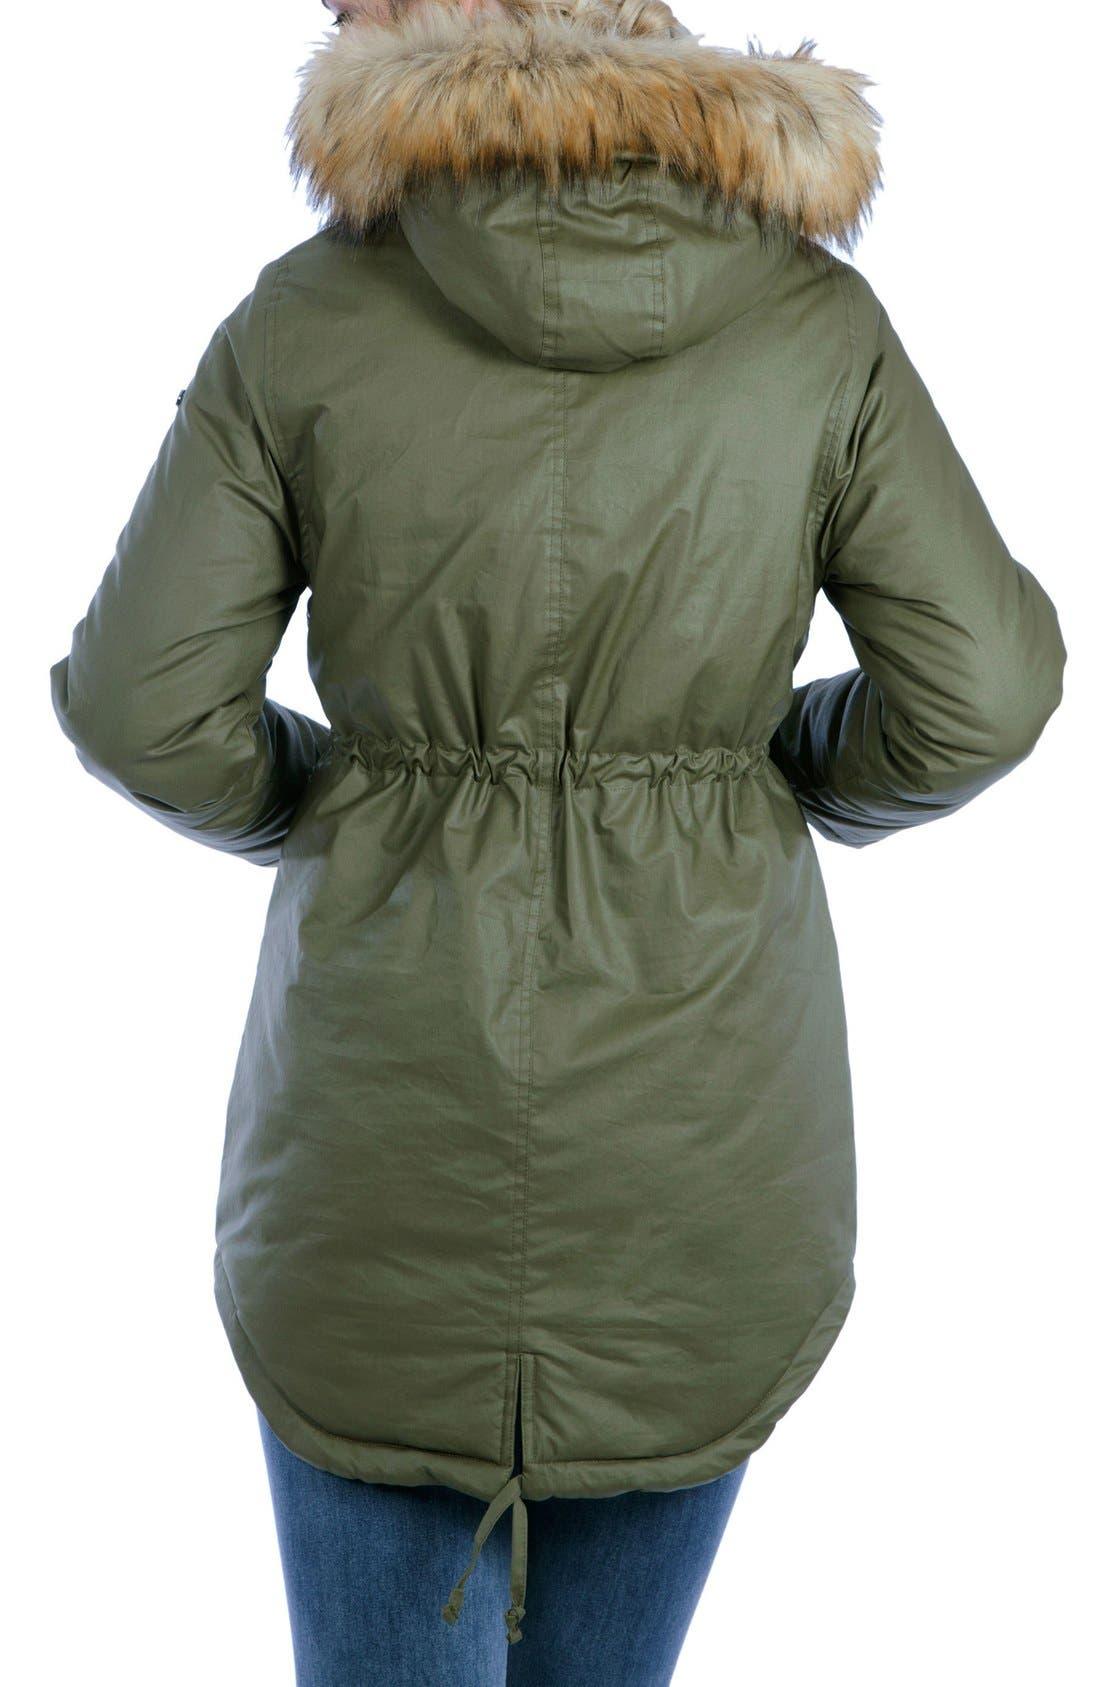 ac49bc64 Women's Faux Fur Coats & Jackets | Nordstrom